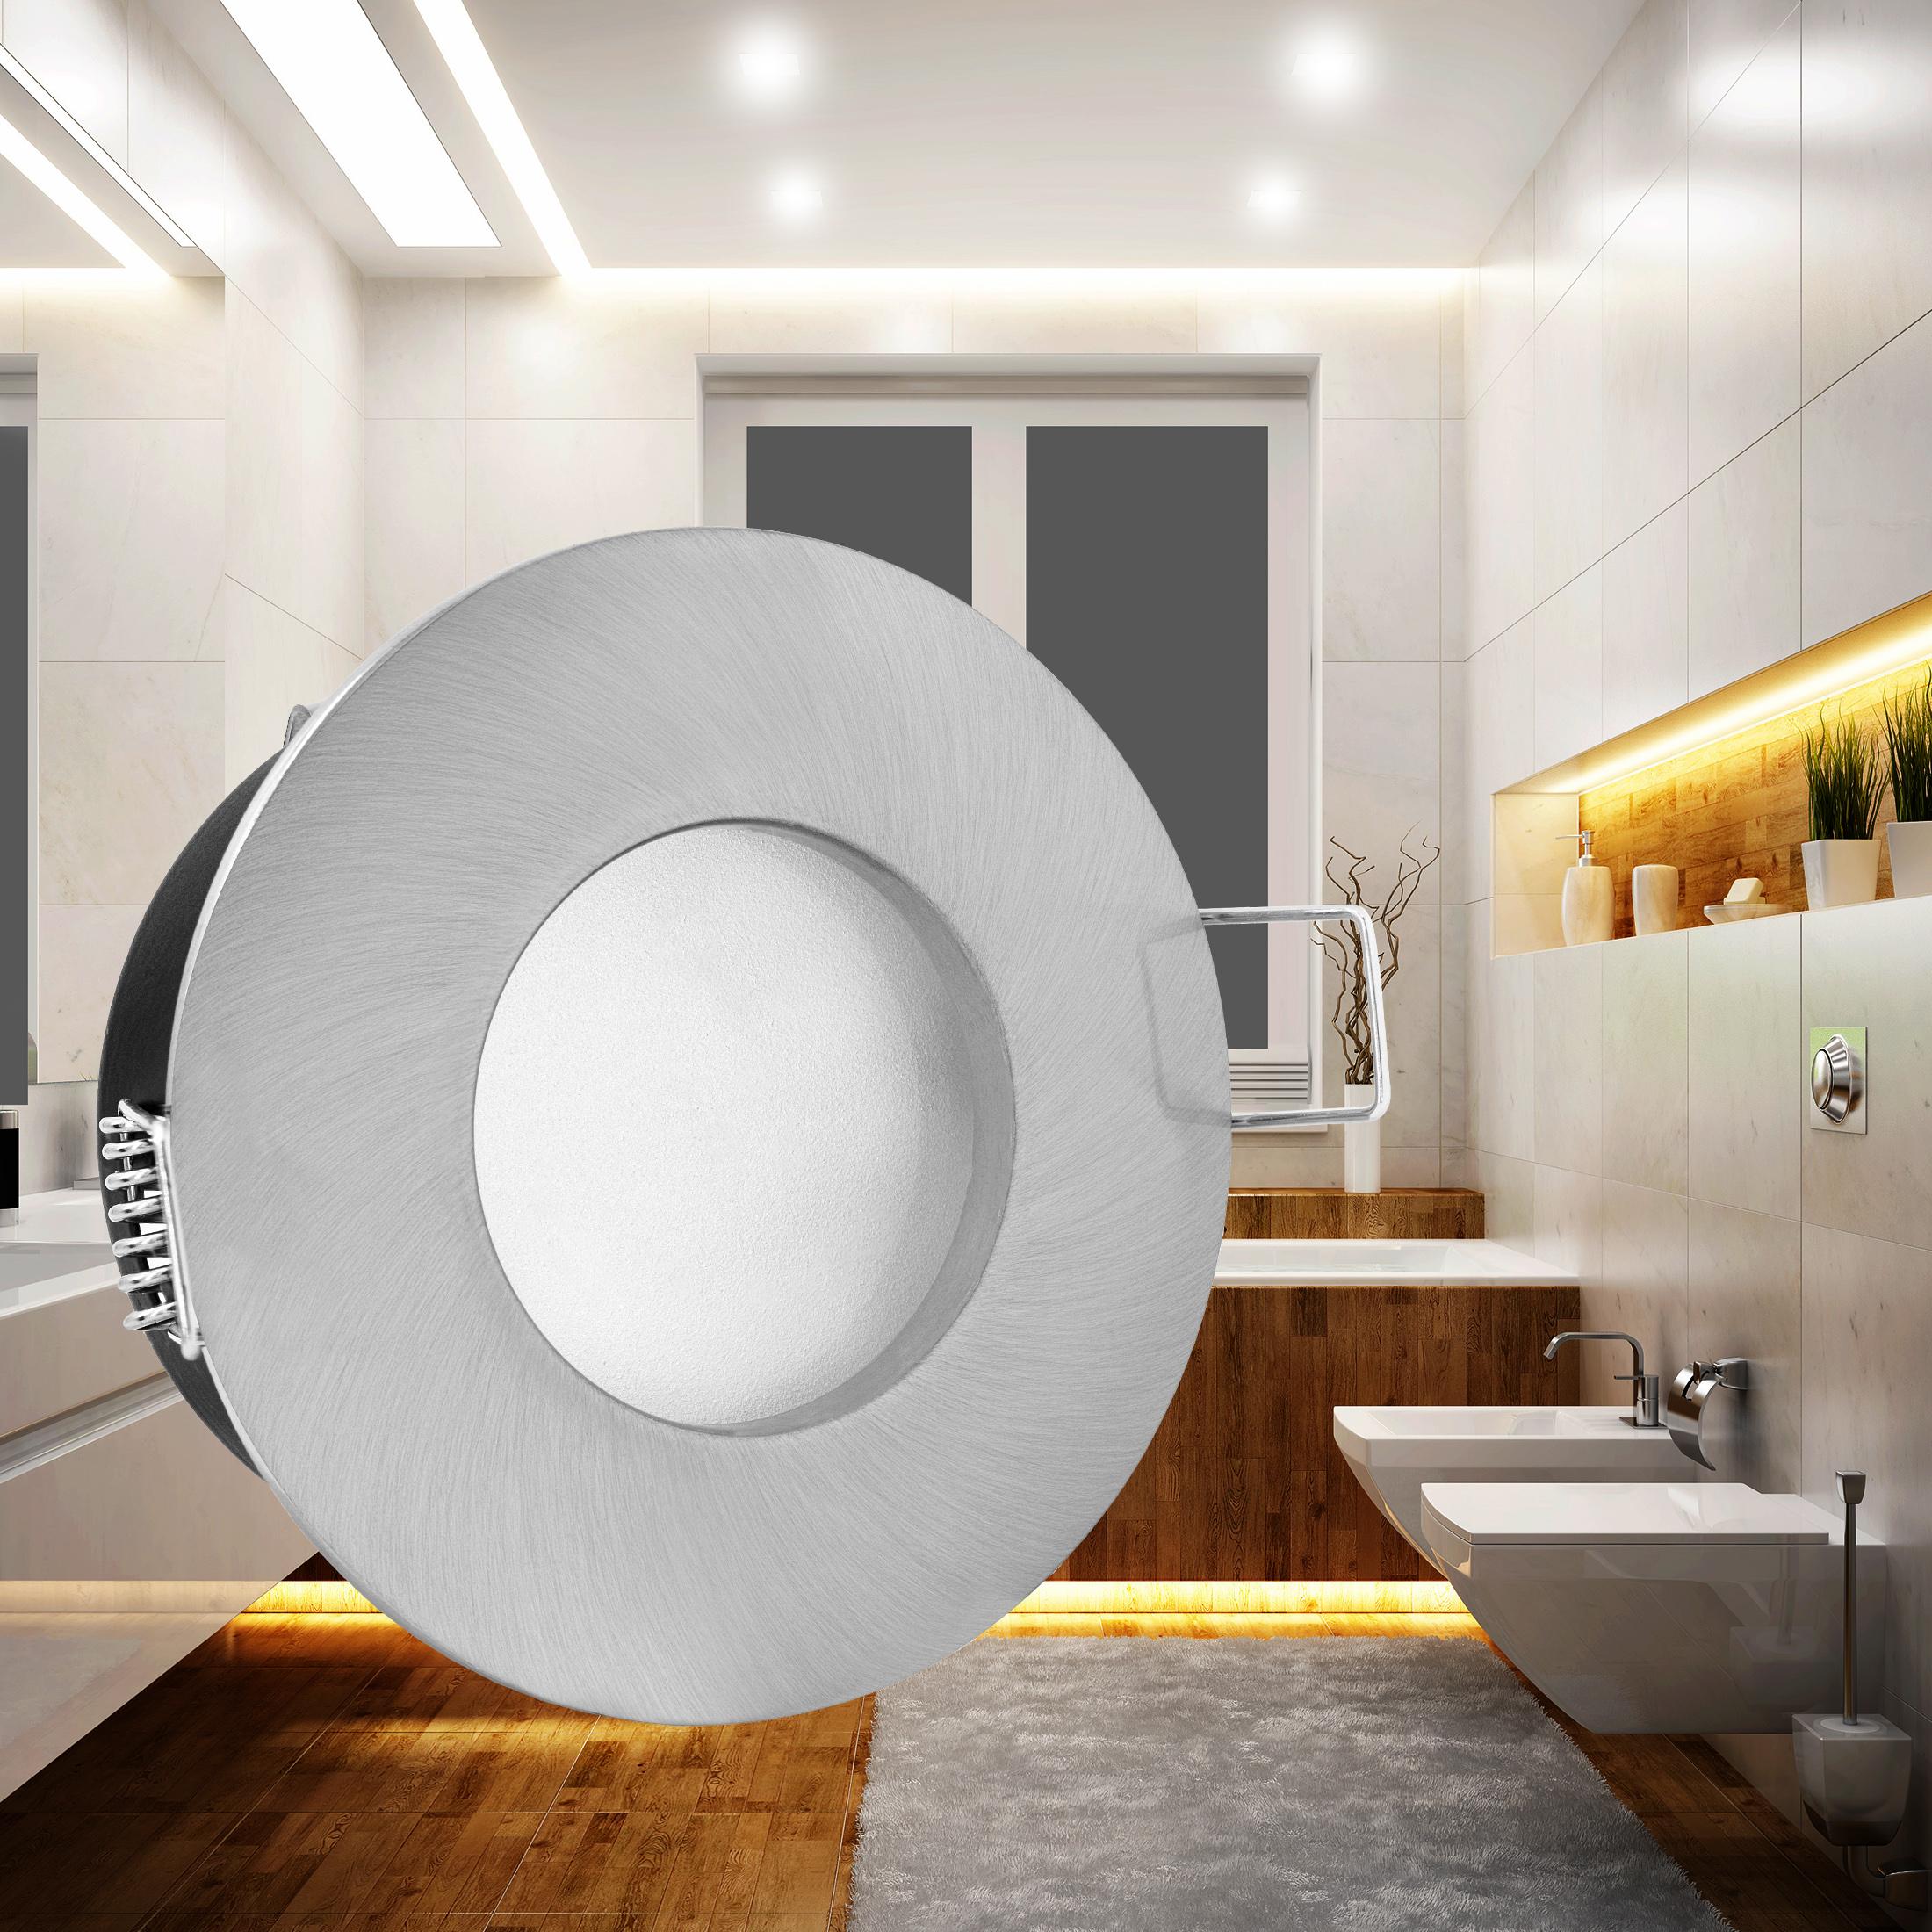 rw 1 feuchtraum led einbaustrahler bad dusche edelstahl geb rstet ip65 5w smd led neutralwei. Black Bedroom Furniture Sets. Home Design Ideas